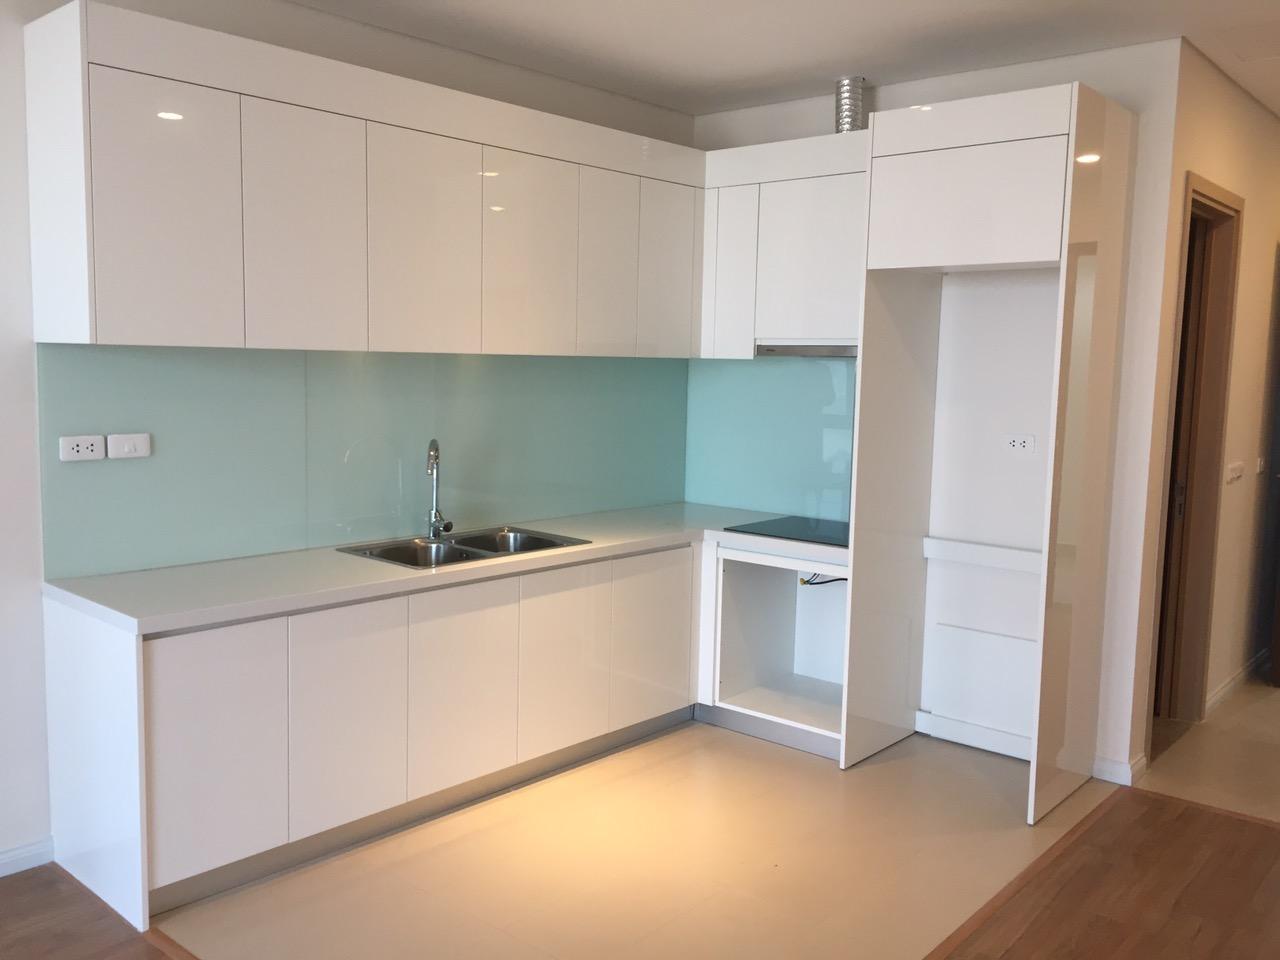 Real Estate Investing Tips You Can Use pic-cho-thue-can-ho-2-ngu-hien-dai-o-mipec-riverside-long-bien-2016111693255